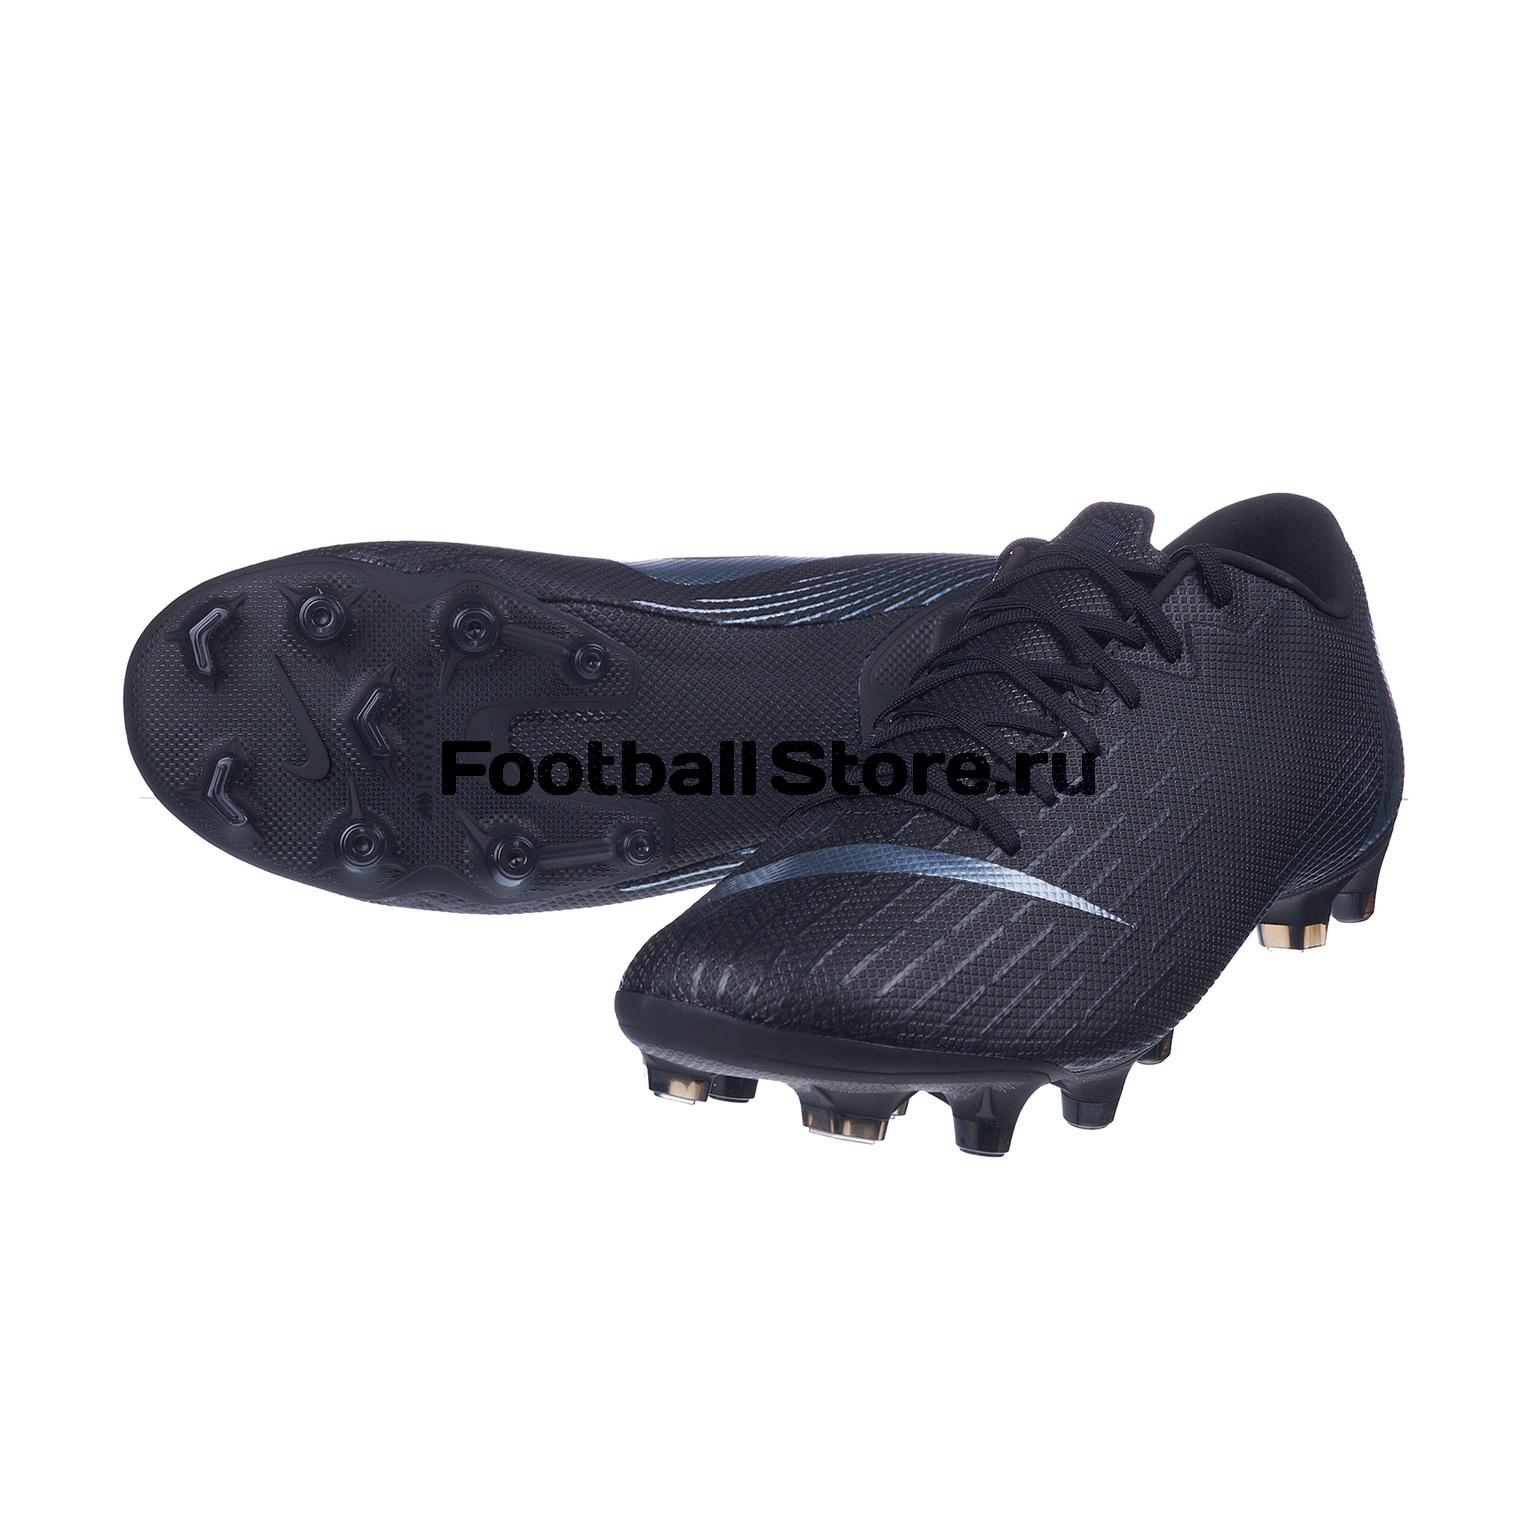 Бутсы Nike Vapor 12 Academy FG/MG AH7375-001 бутсы nike mercurial victory iii fg 509128 800